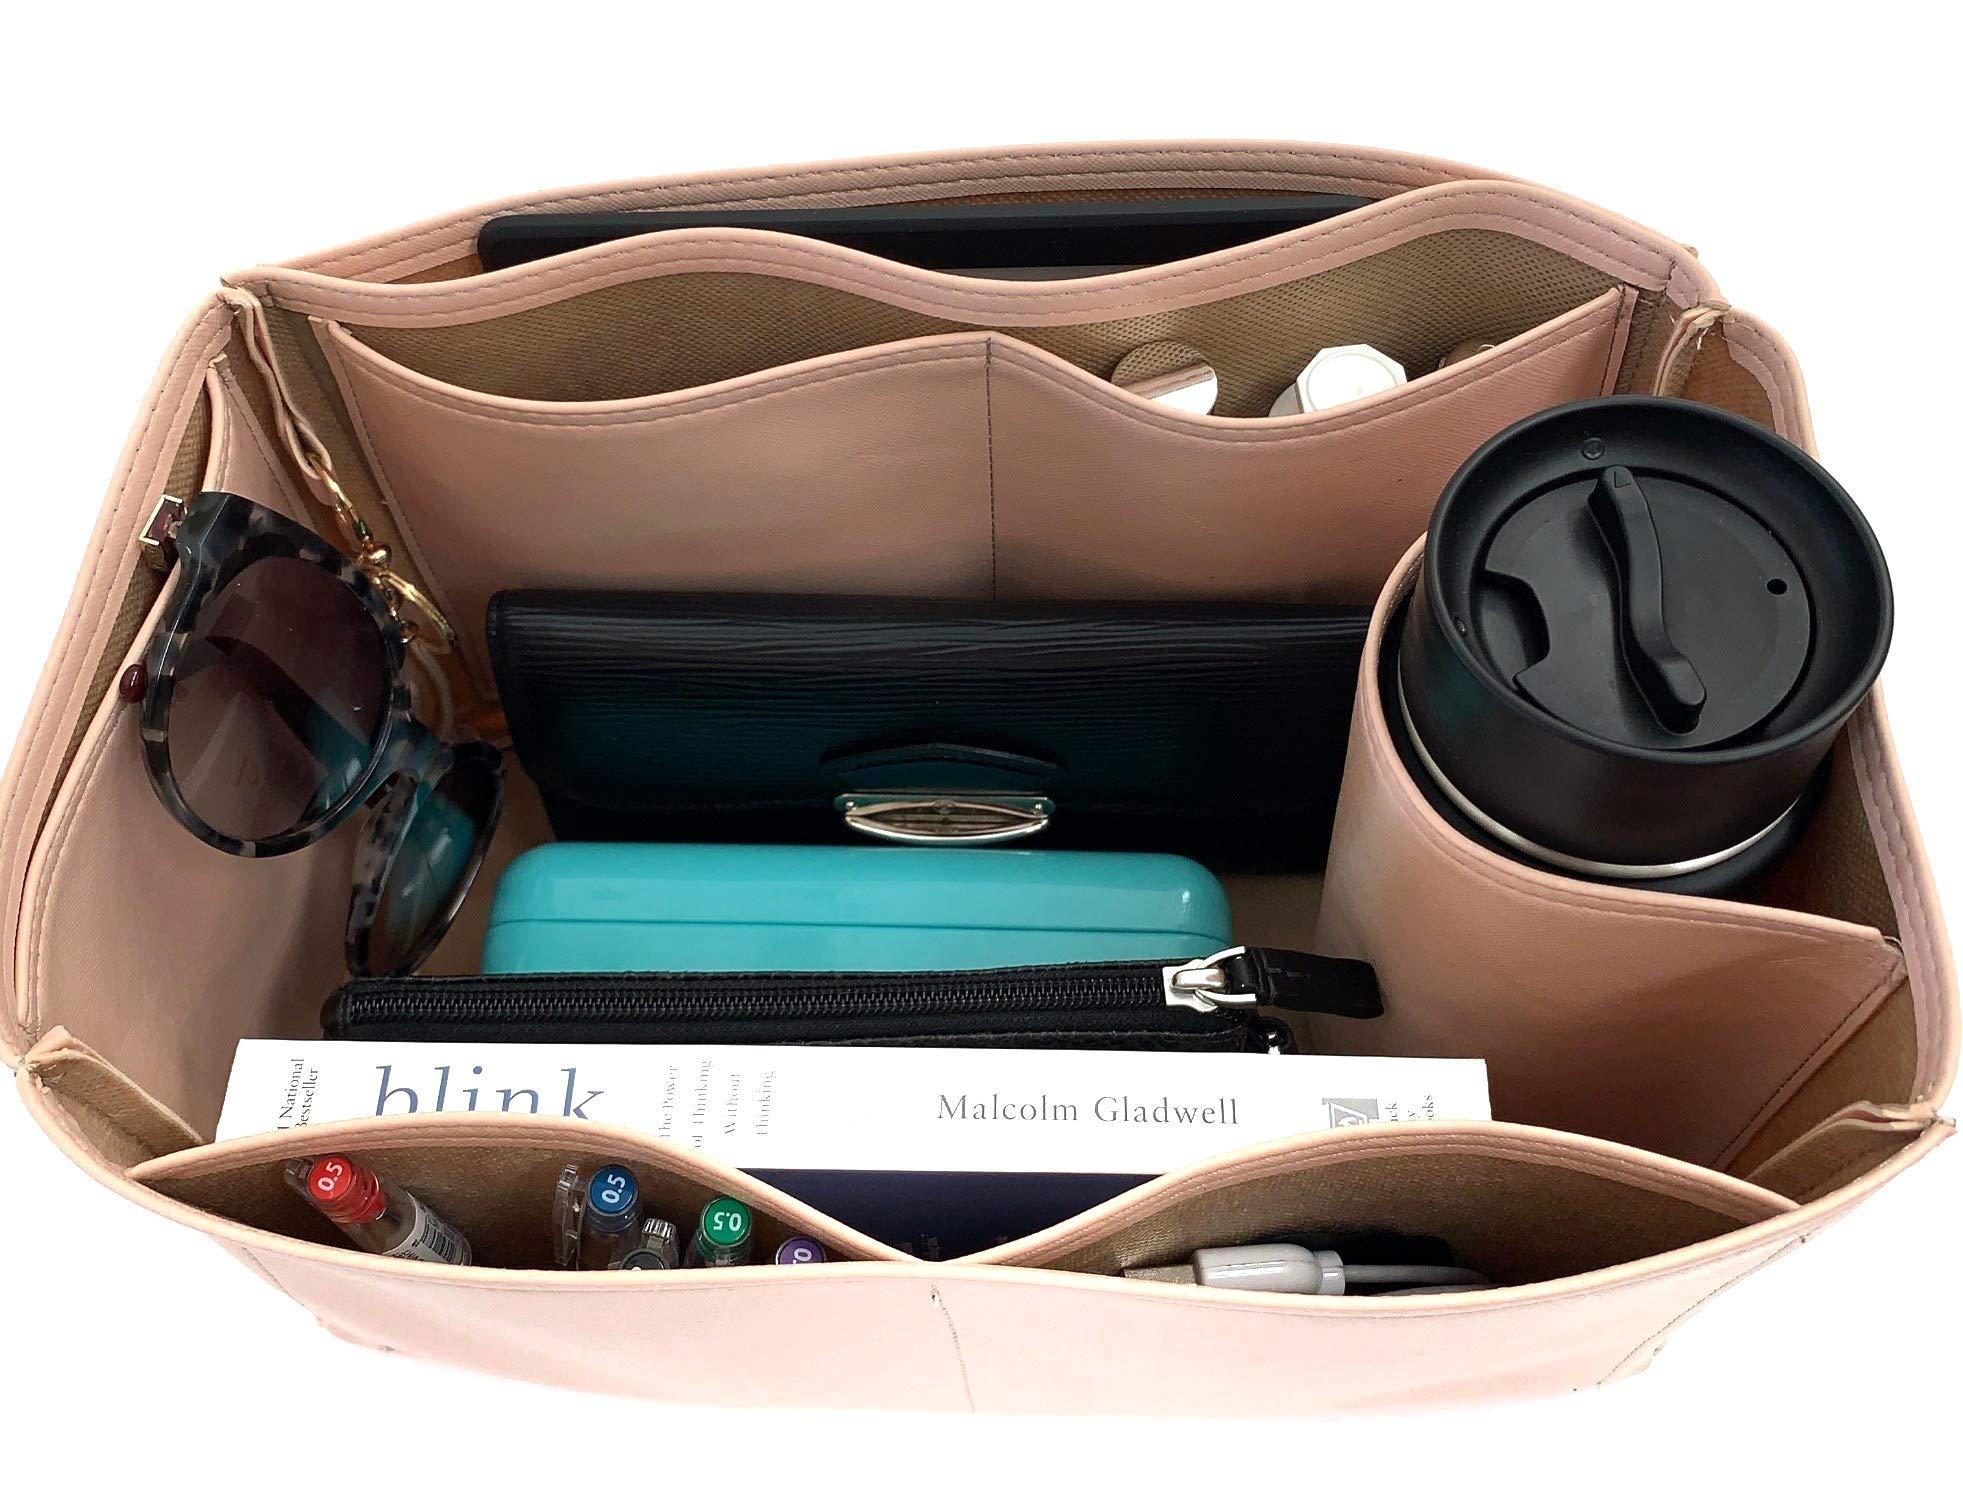 Purse Organizer Insert for LV Neverfull Handbag - Fits inside Louis Vuitton Neverfull MM bag - Vegan Leather (MM, Blush Pink)